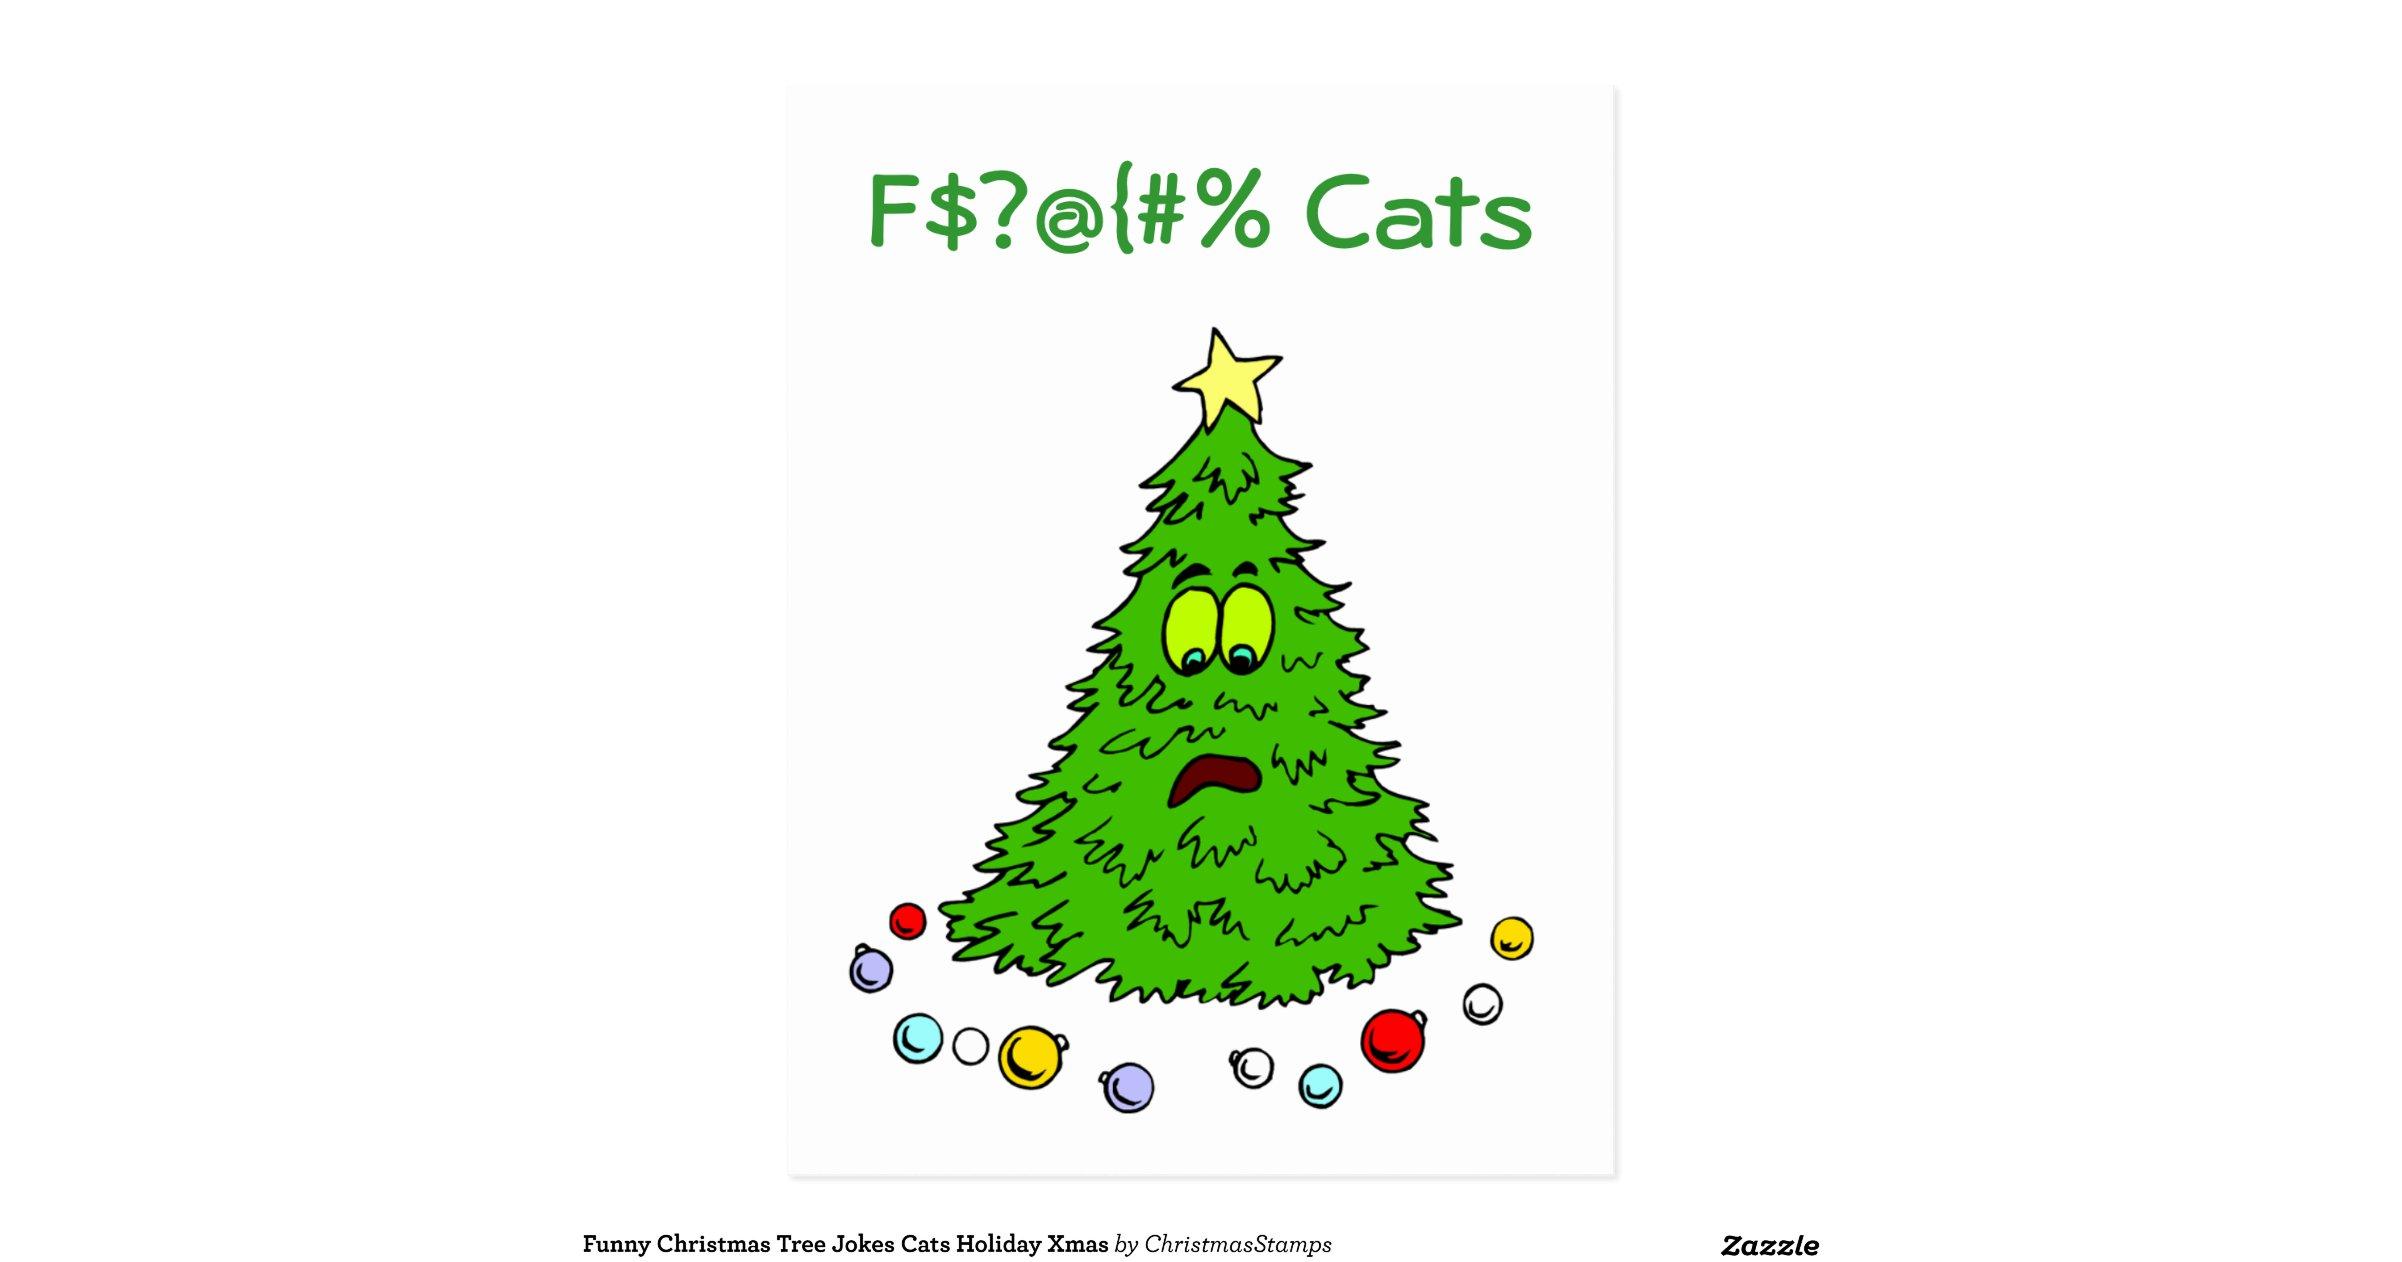 Funnychristmastreejokescatsholidaypostcard